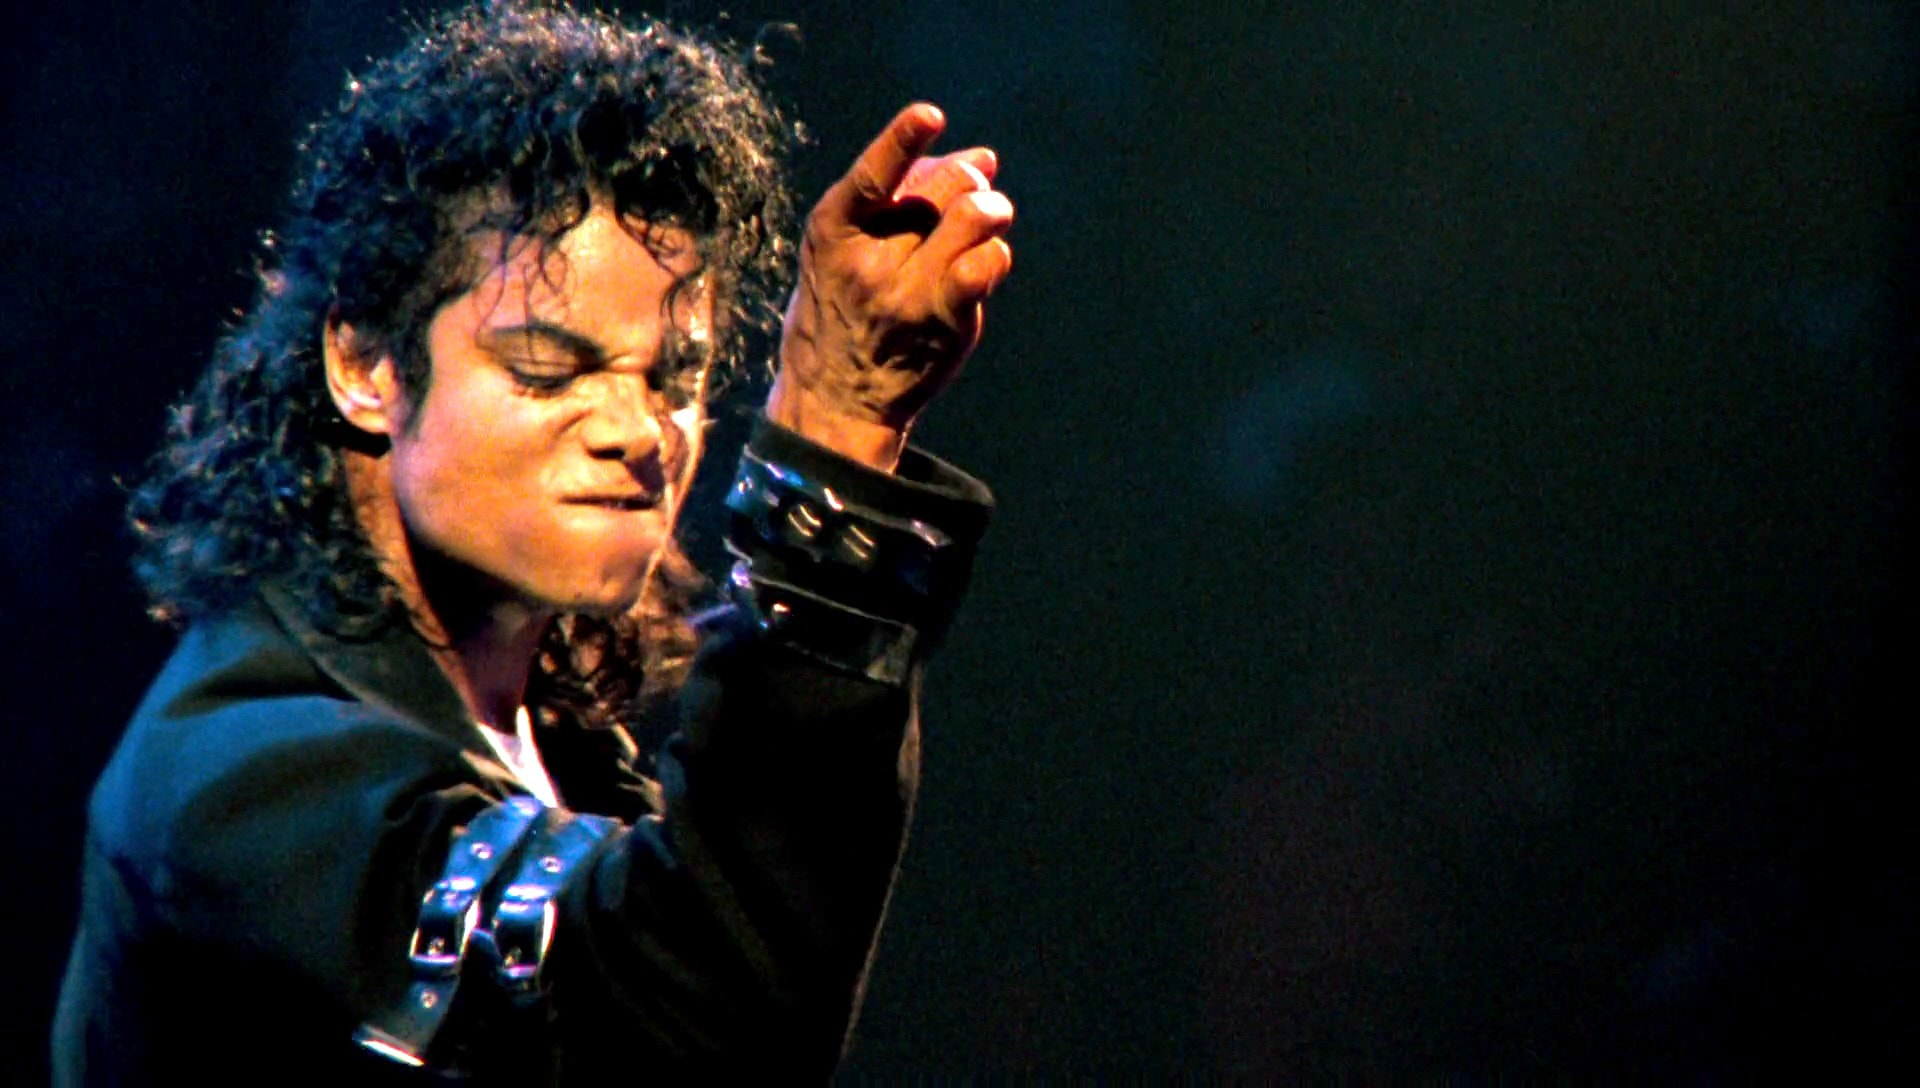 Michael Jackson Hd Wallpapers 7wallpapers Net